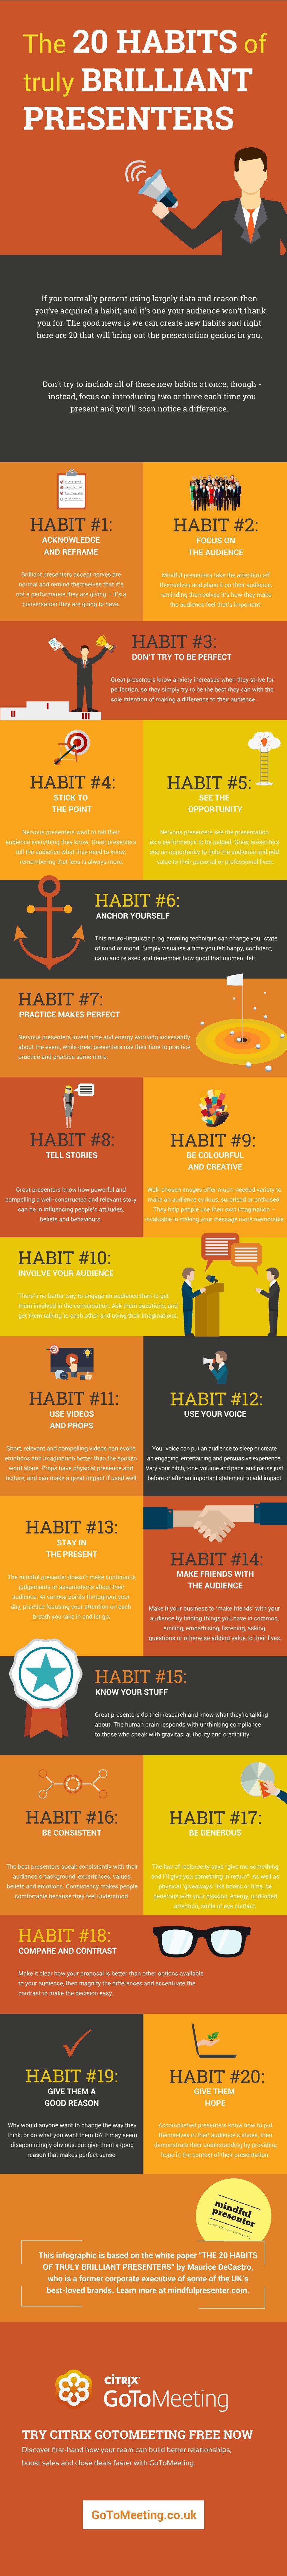 20 Habits οf Truly Brilliant Presenters Infographic